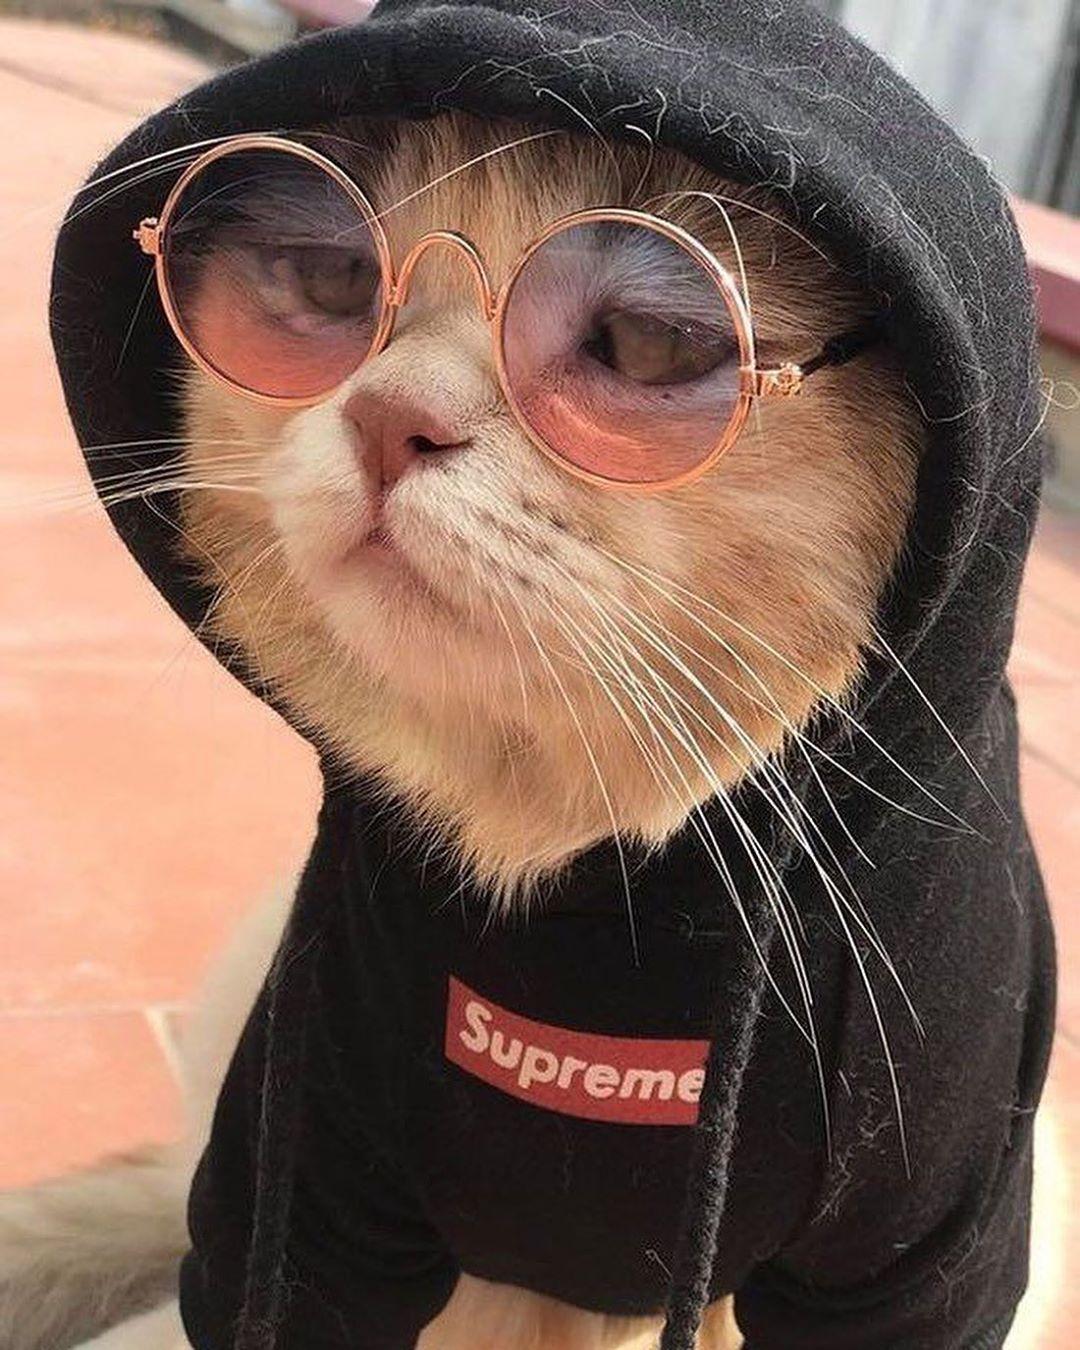 Choose Your Favorite One 1 2 3 Perchases This To Ur Little Cat Supreme Gucci Komik Hayvan Hayvan Mizahi Komik Hayvan Fotograflari